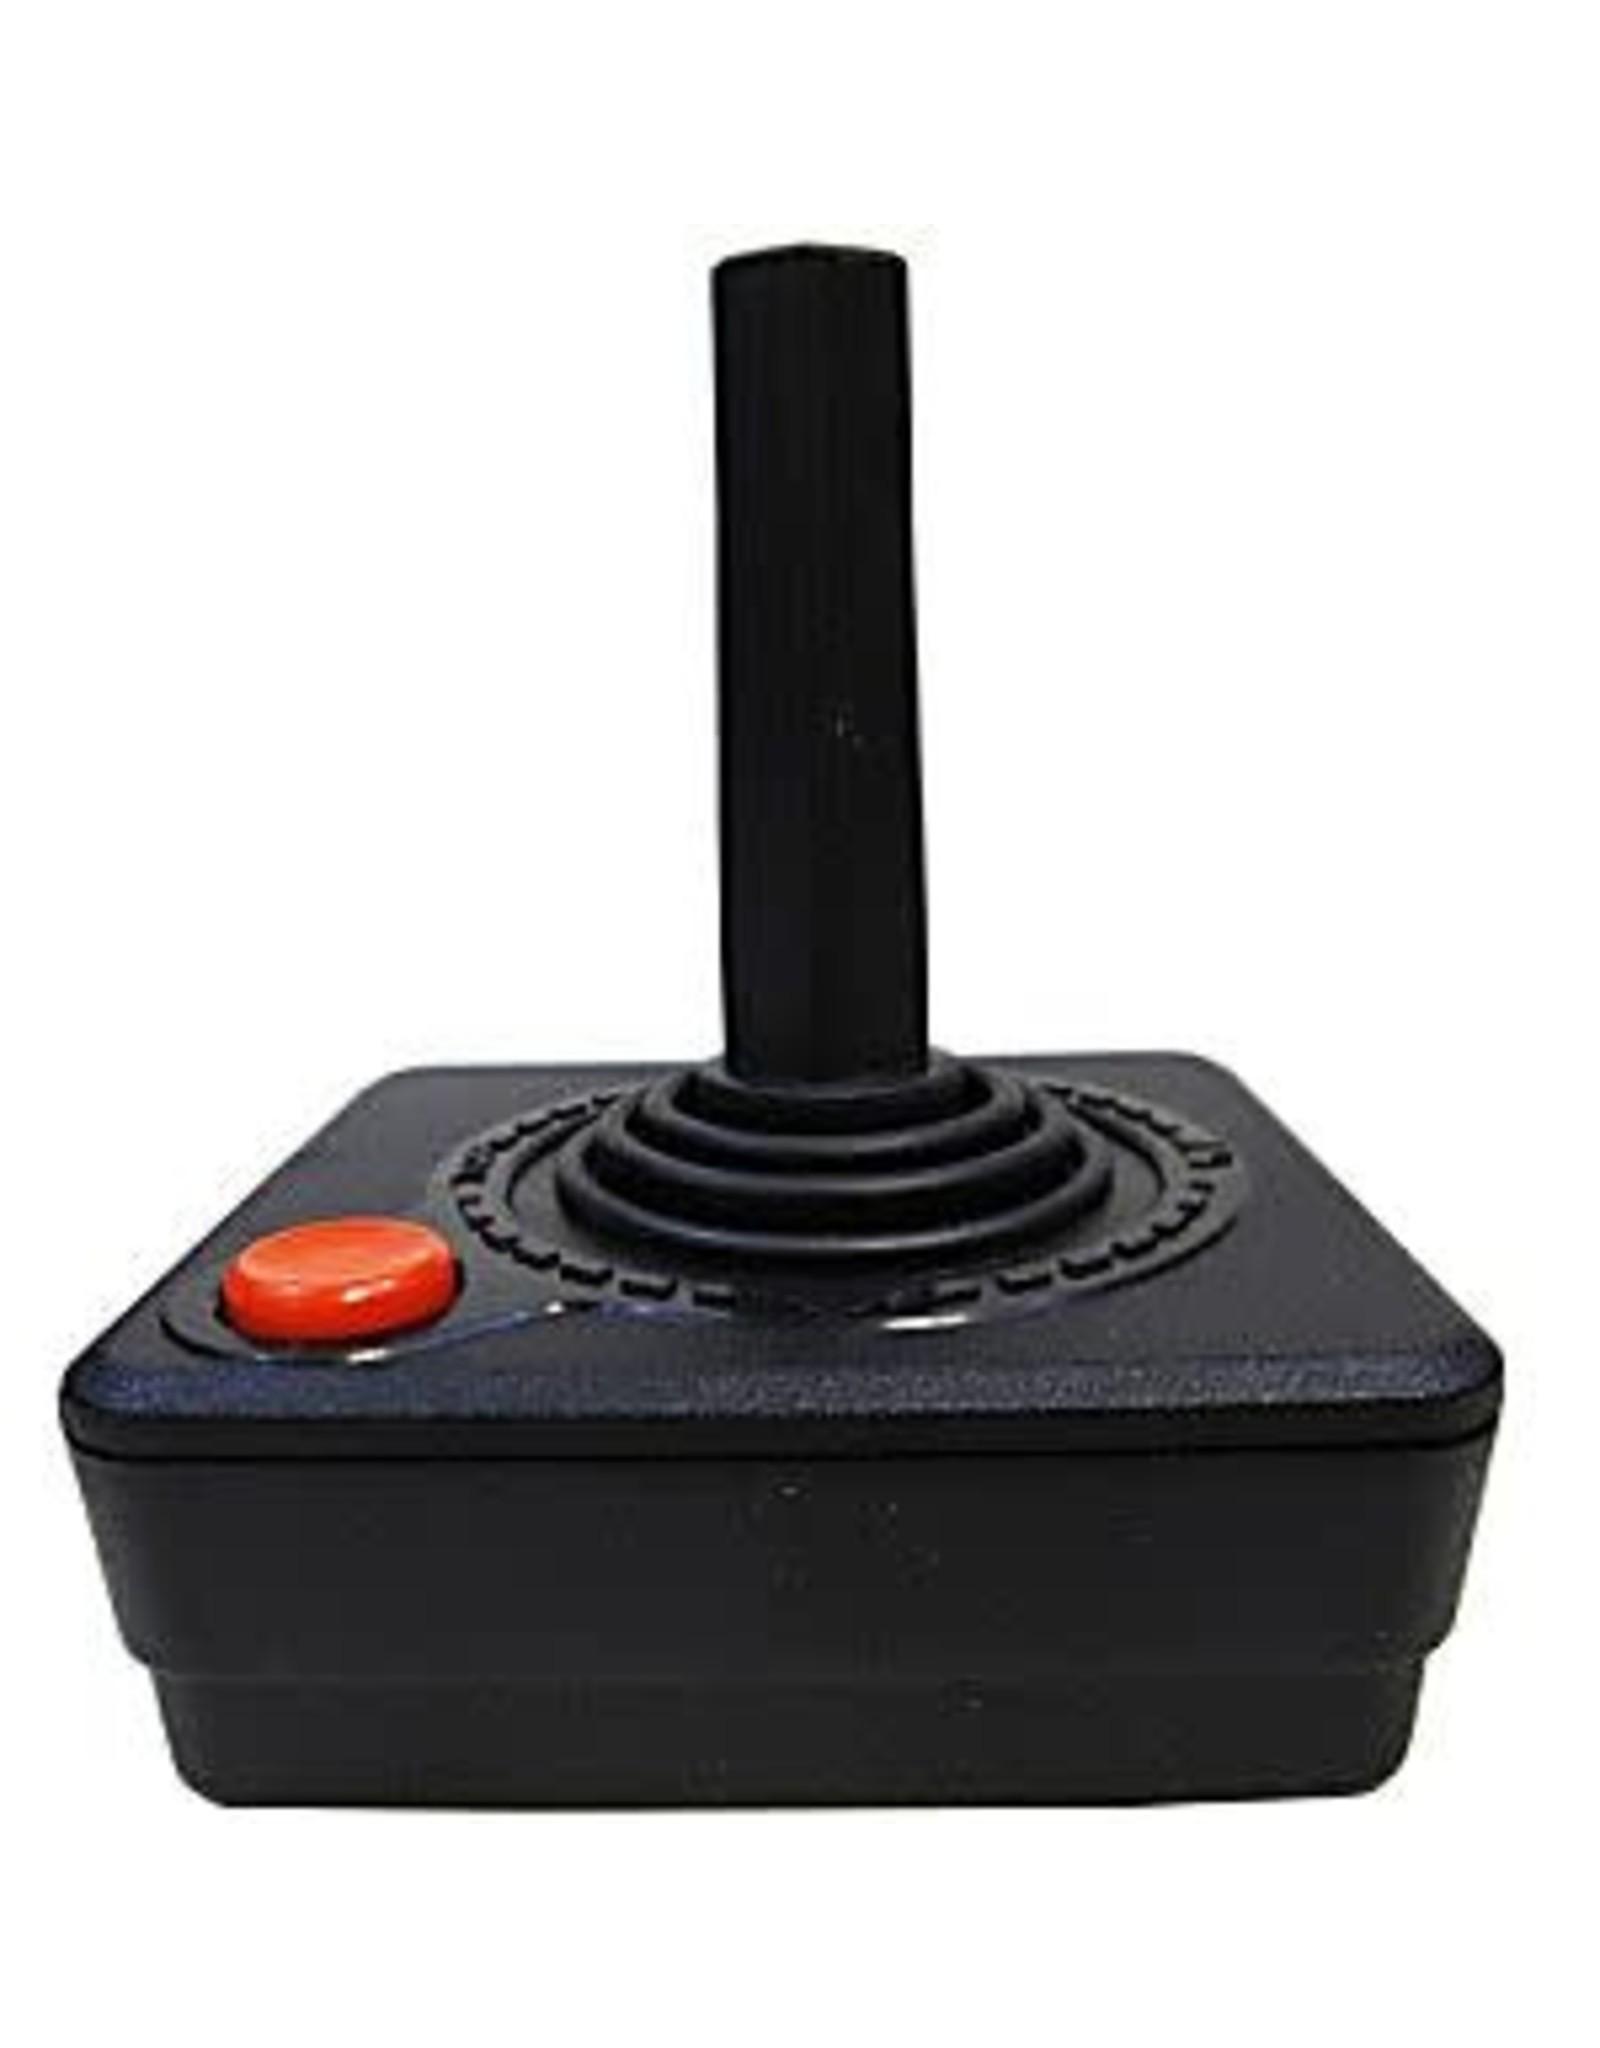 Atari Atari 2600 Joystick Controller (SJ)